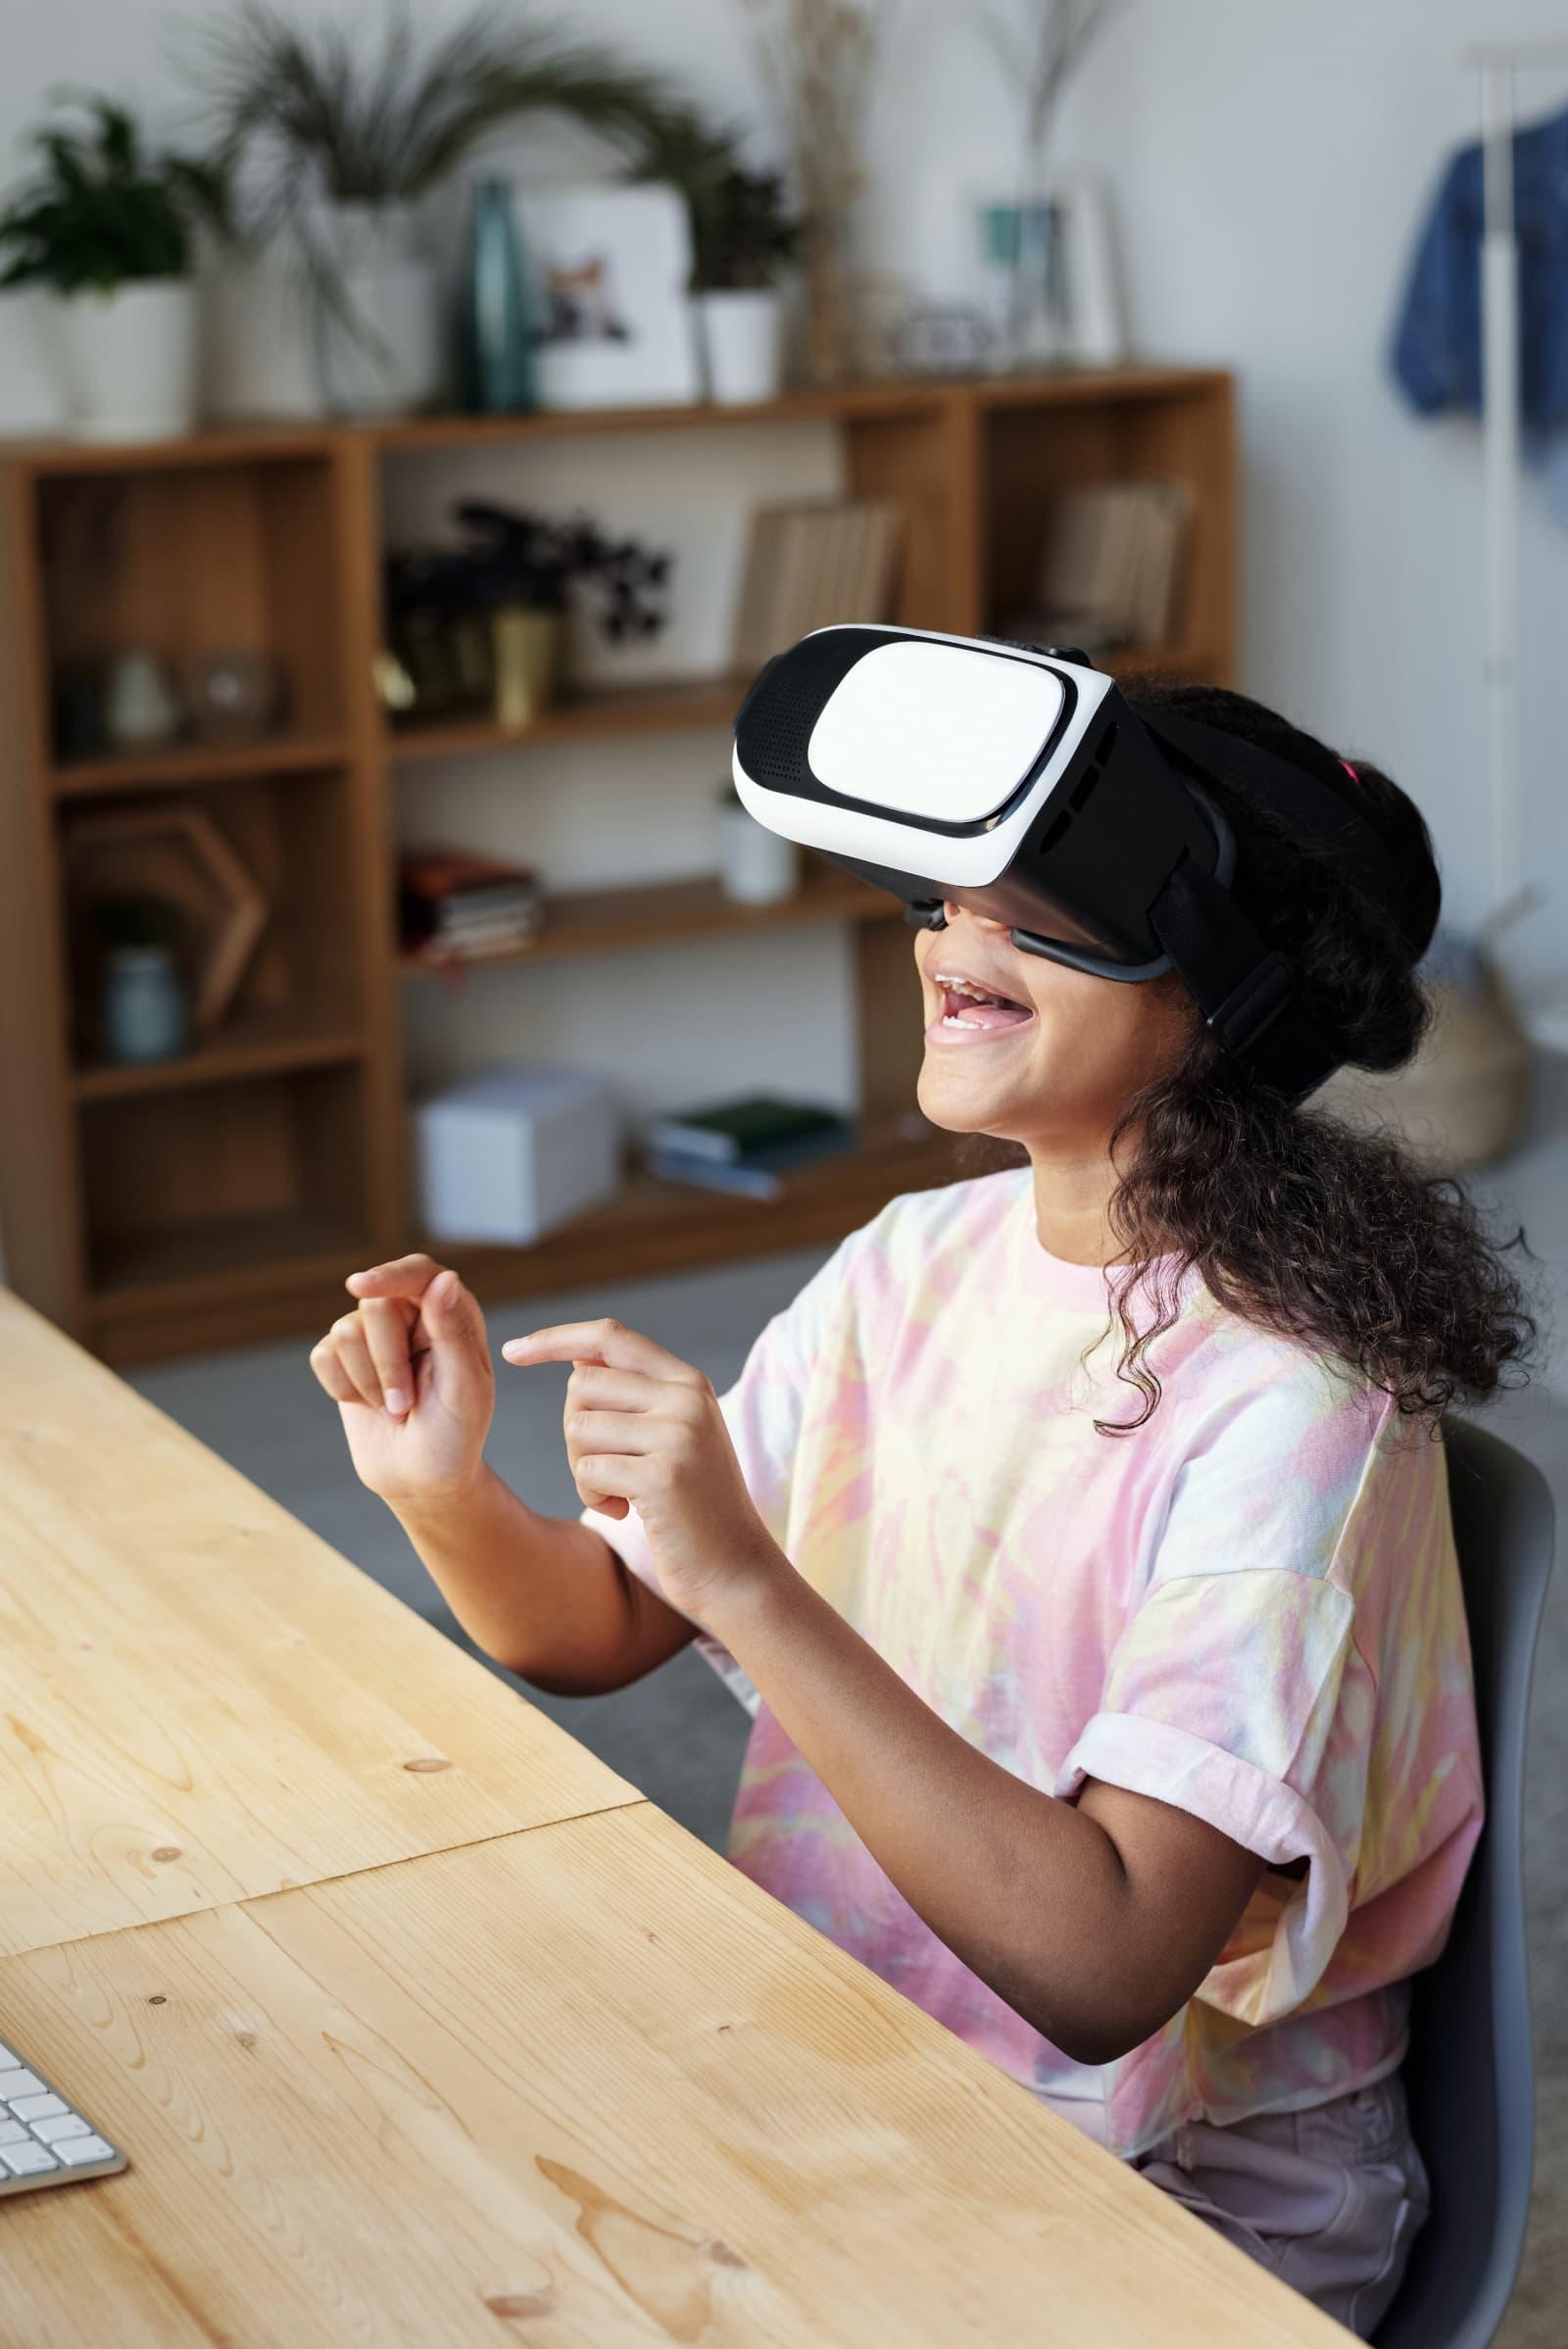 Child In VR Set